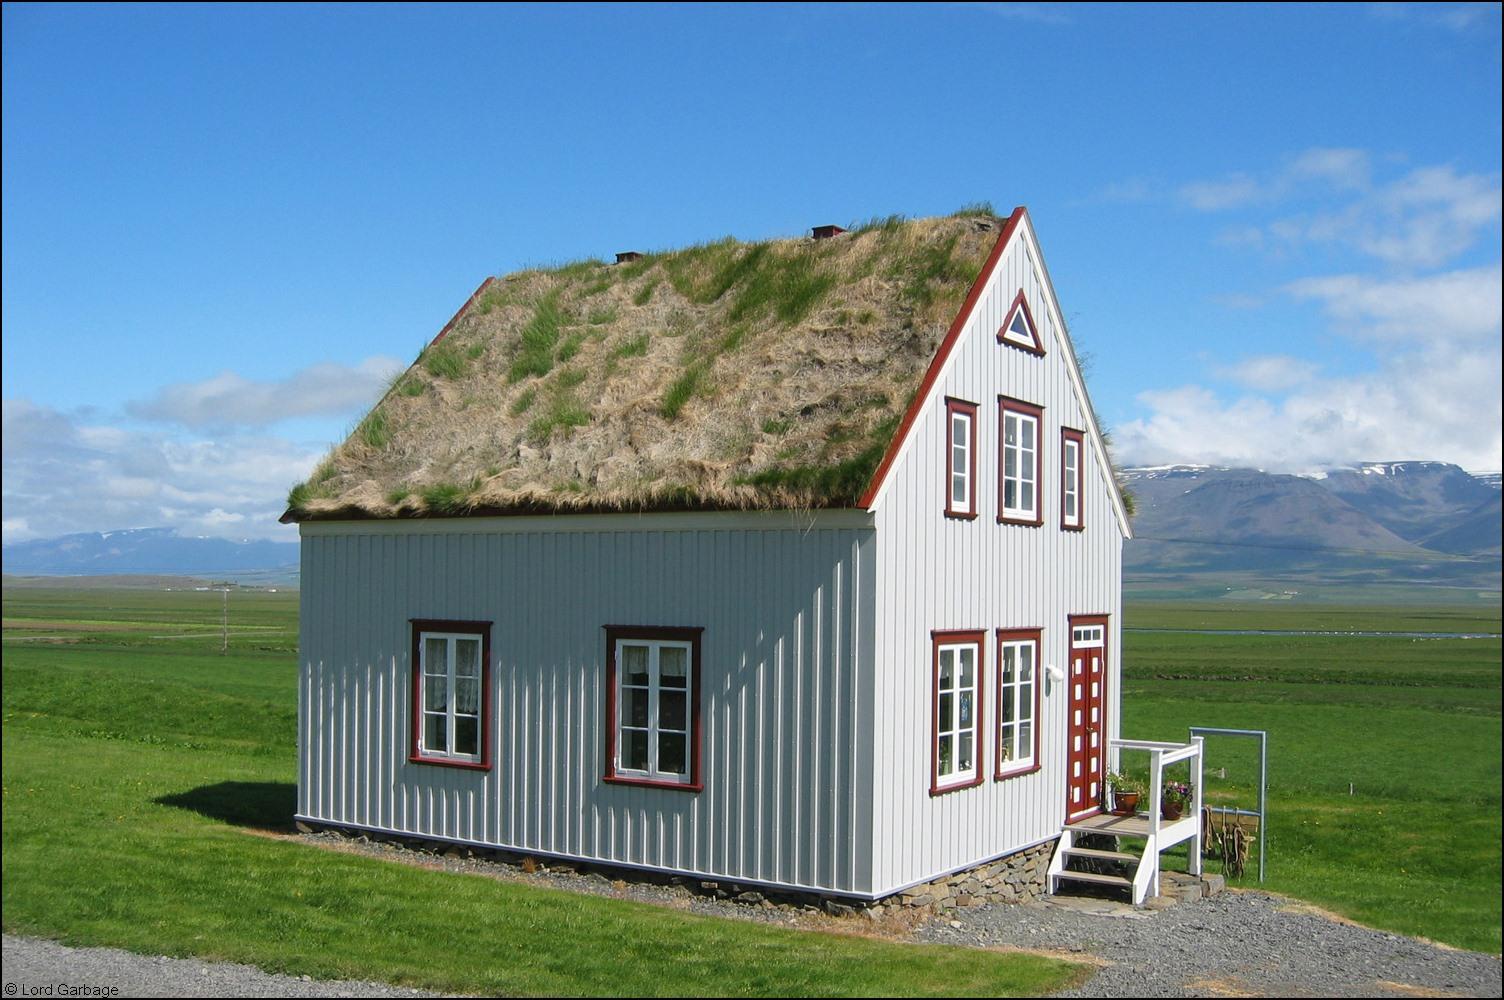 Island Haus Foto & Bild